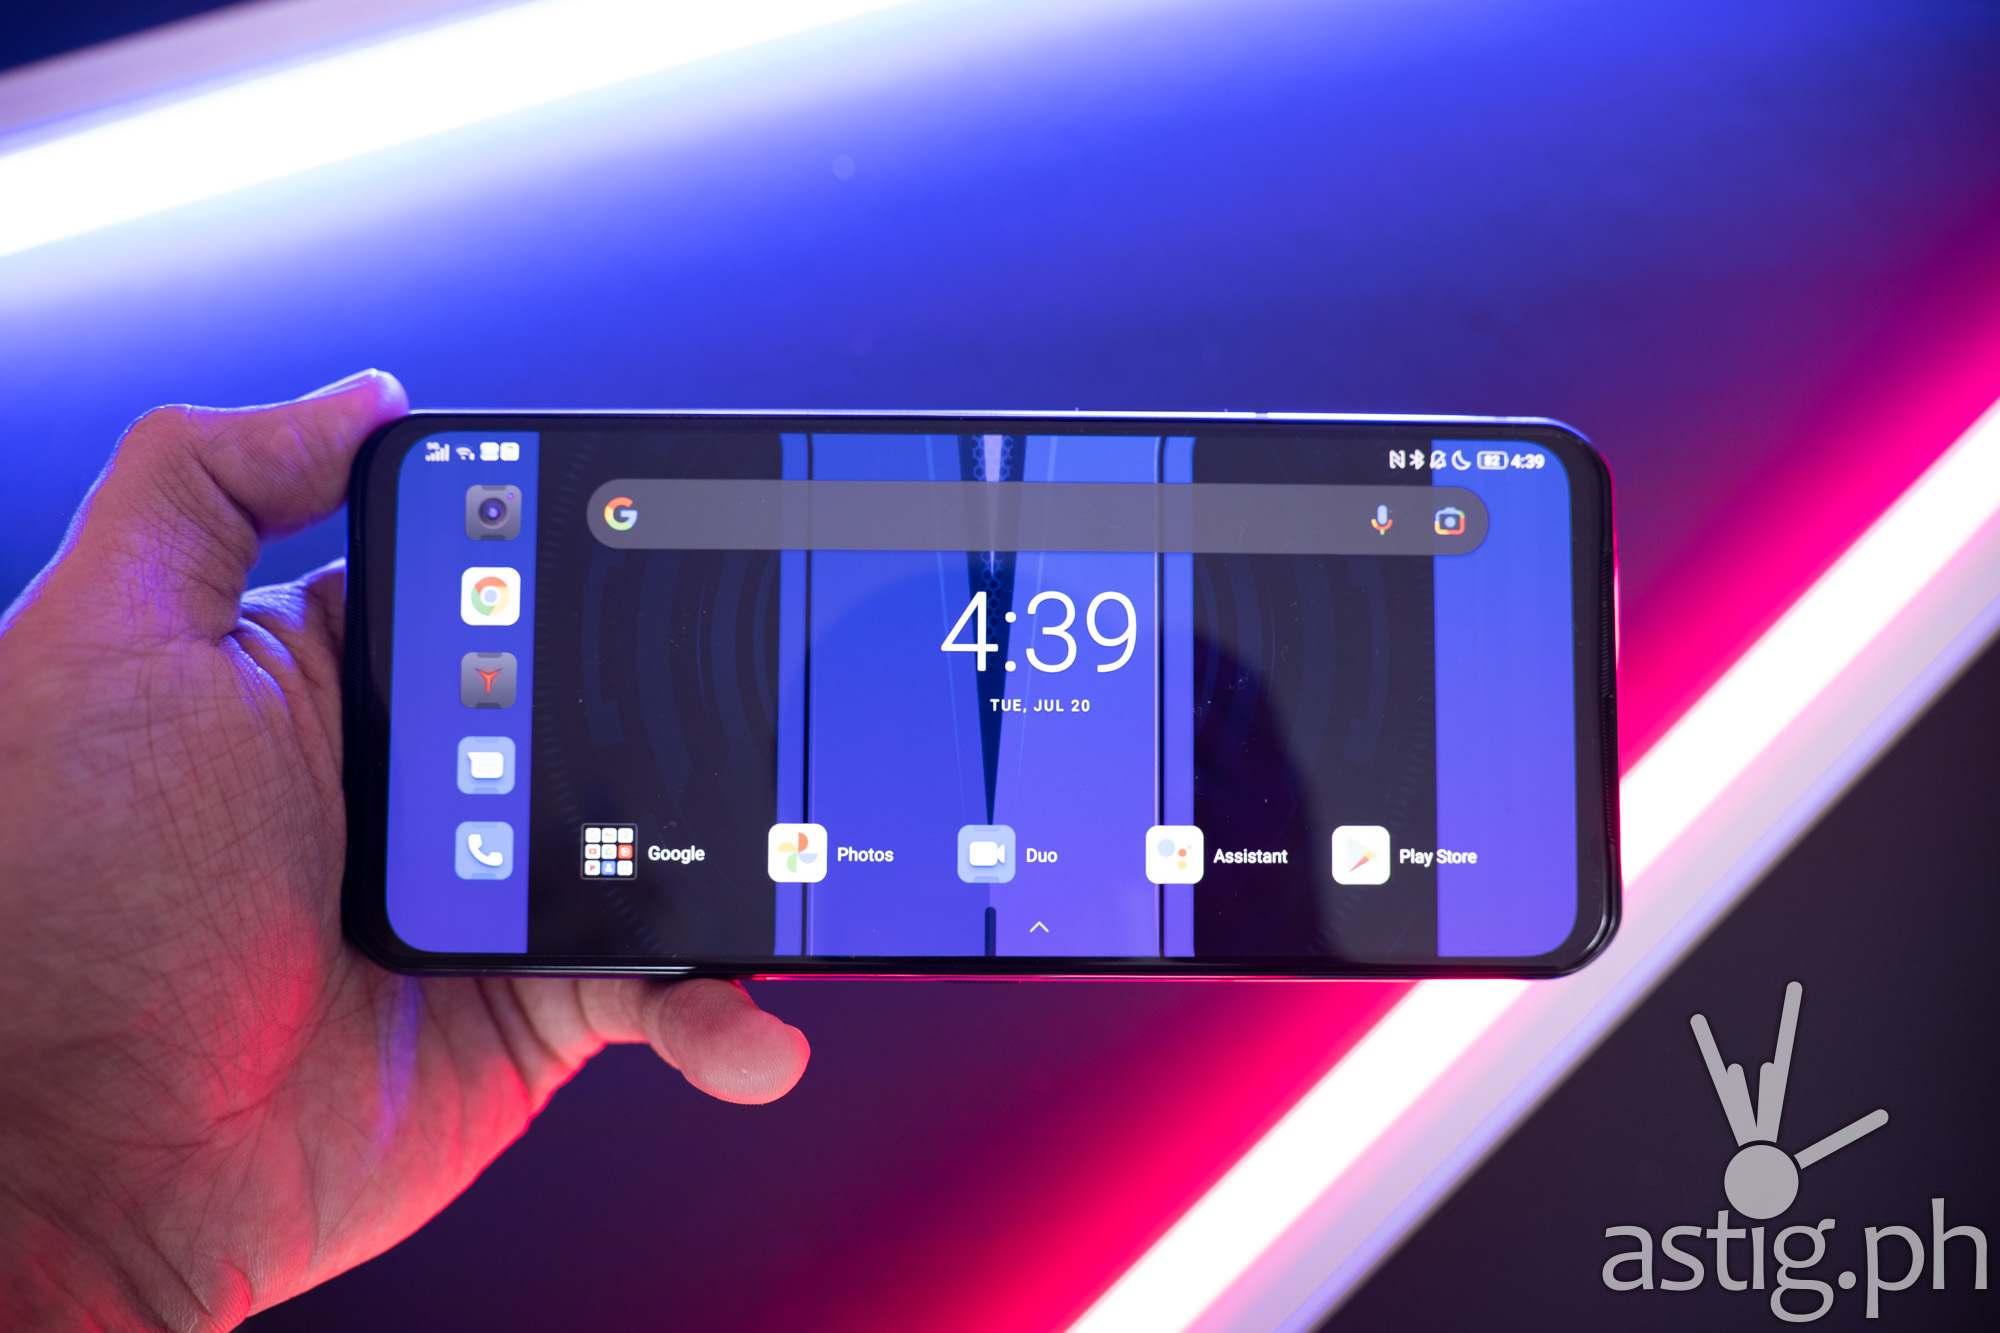 Handheld landscape front - Legion Phone Duel 2 (Philippines)